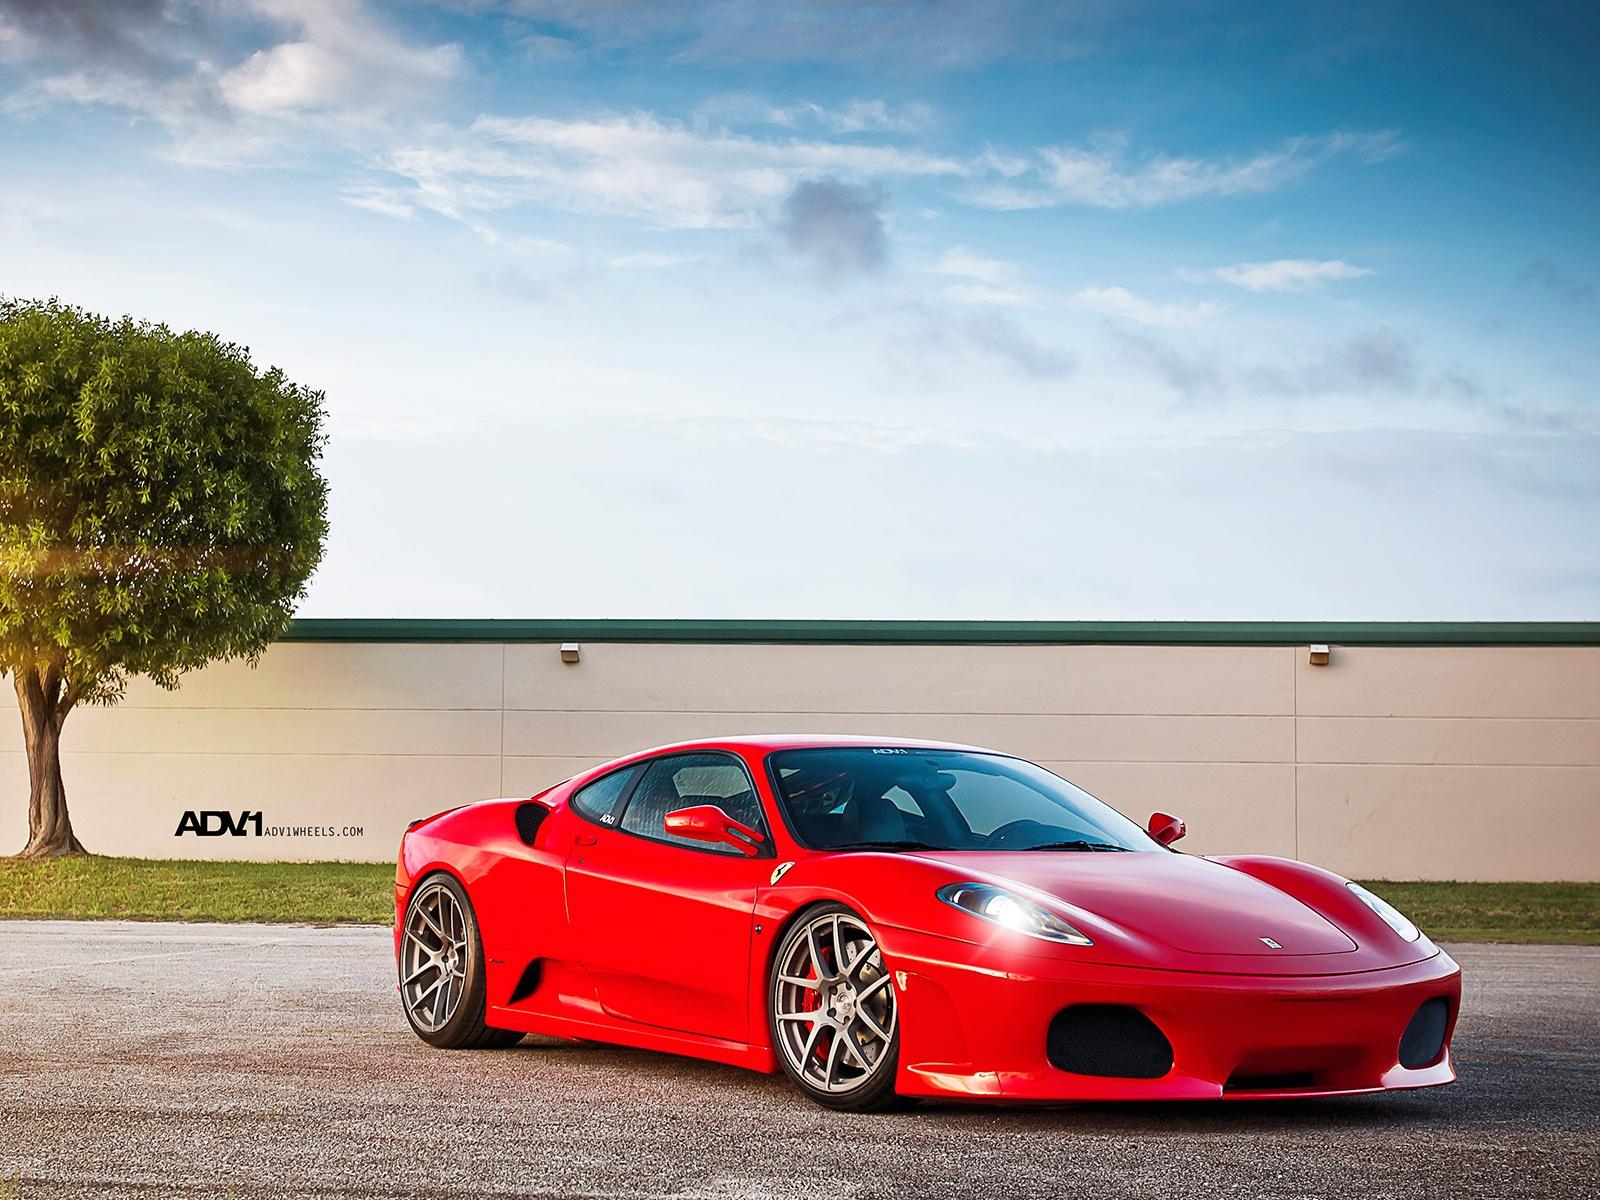 High Definition Wallpaper Club: ADV1 Wheels Ferrari F430 ...